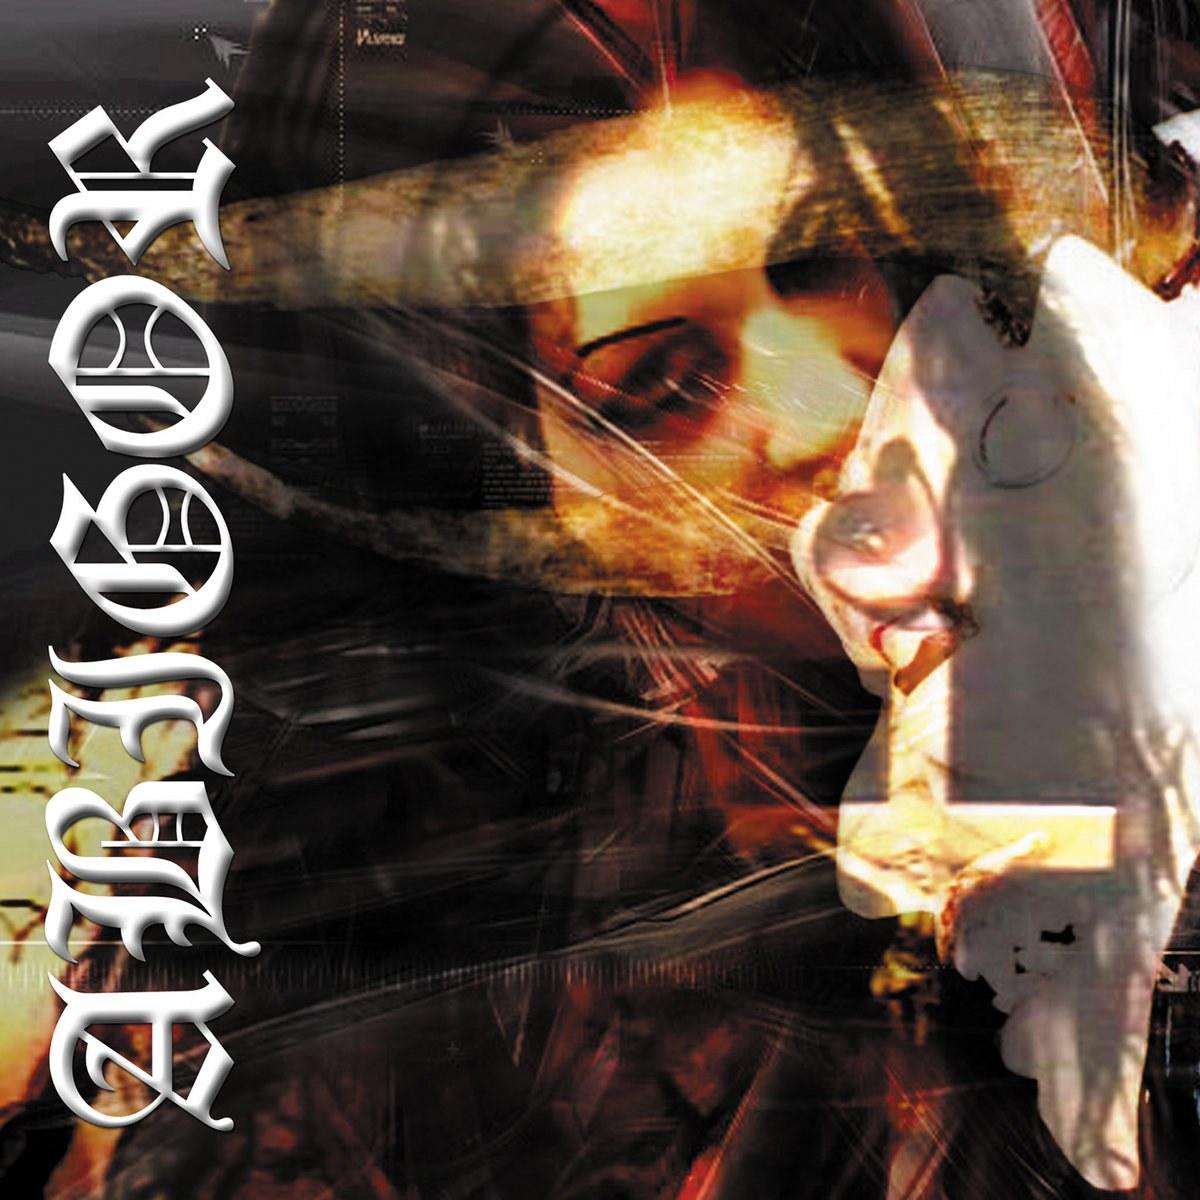 Reviews for Abigor - Shockwave 666